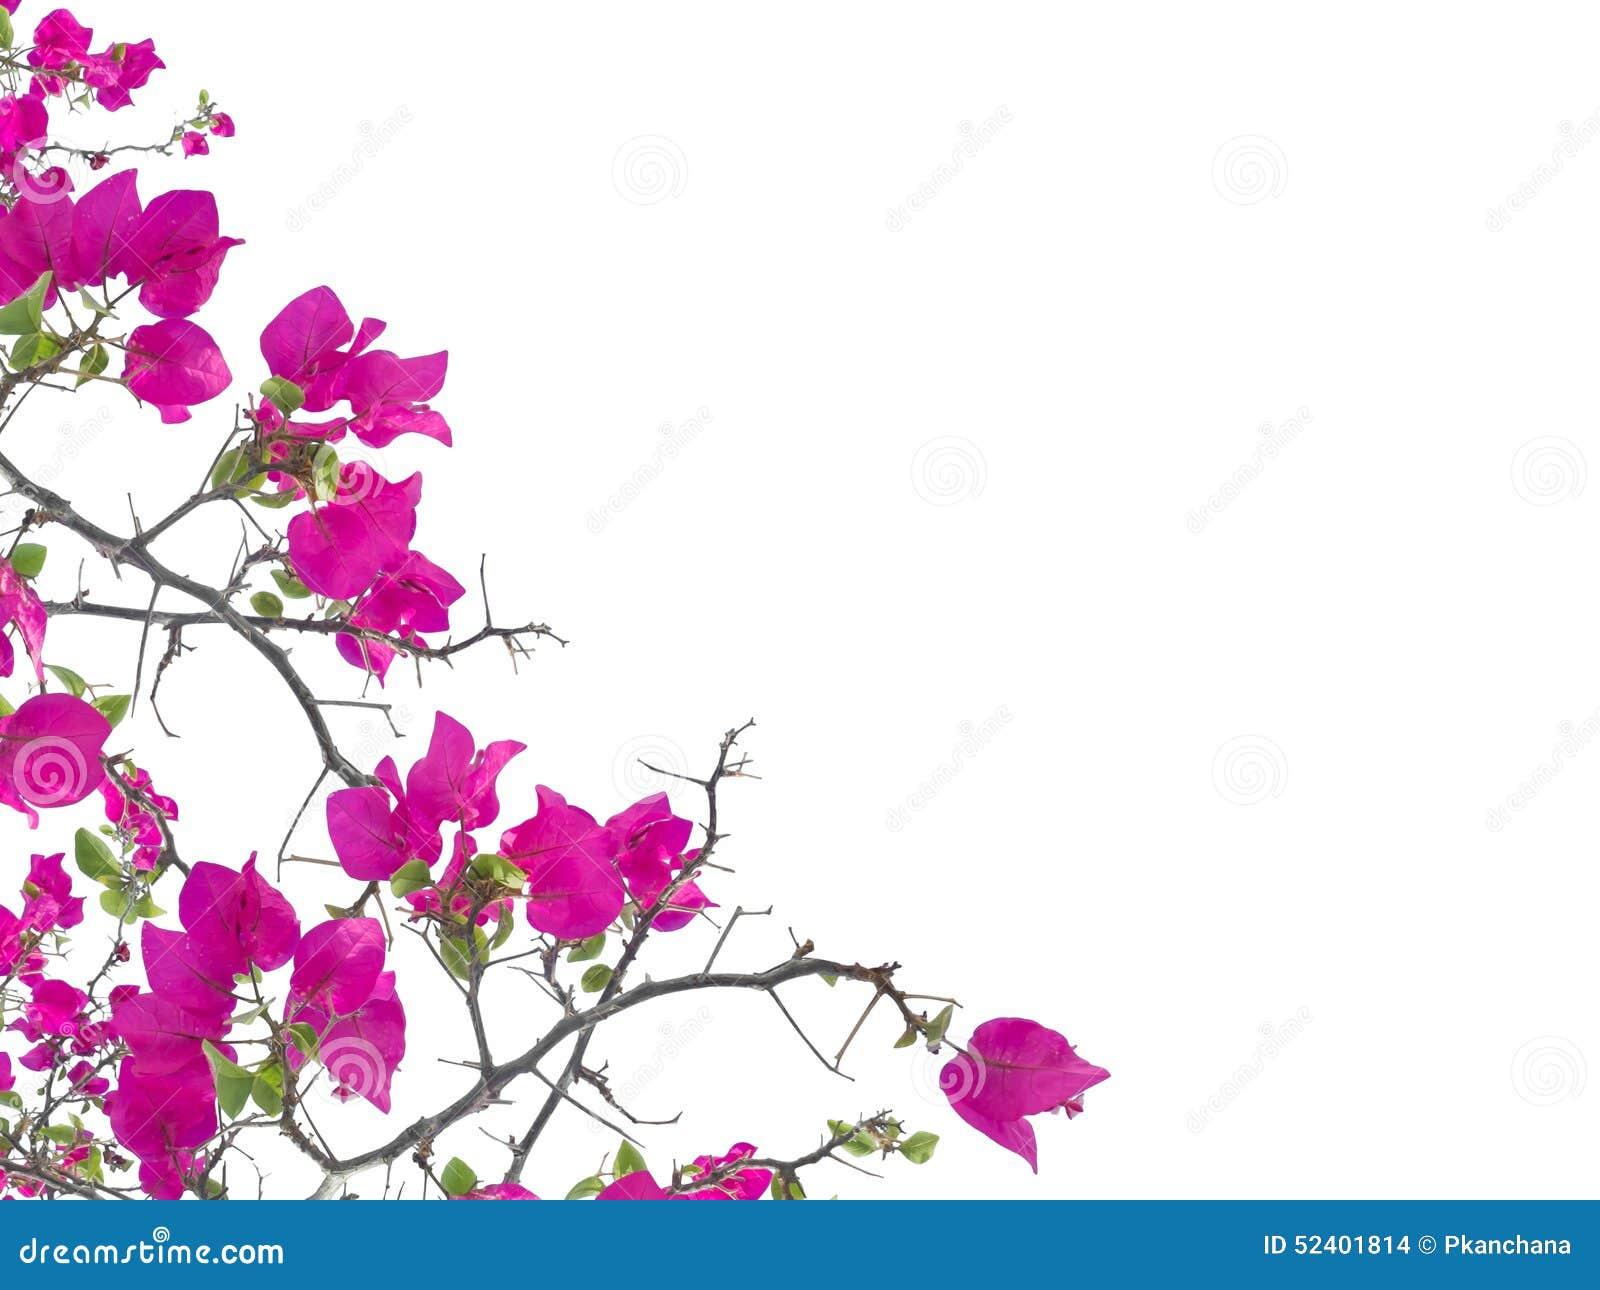 Pink Petunia Flower Isolated Stock Photo Image Of Background